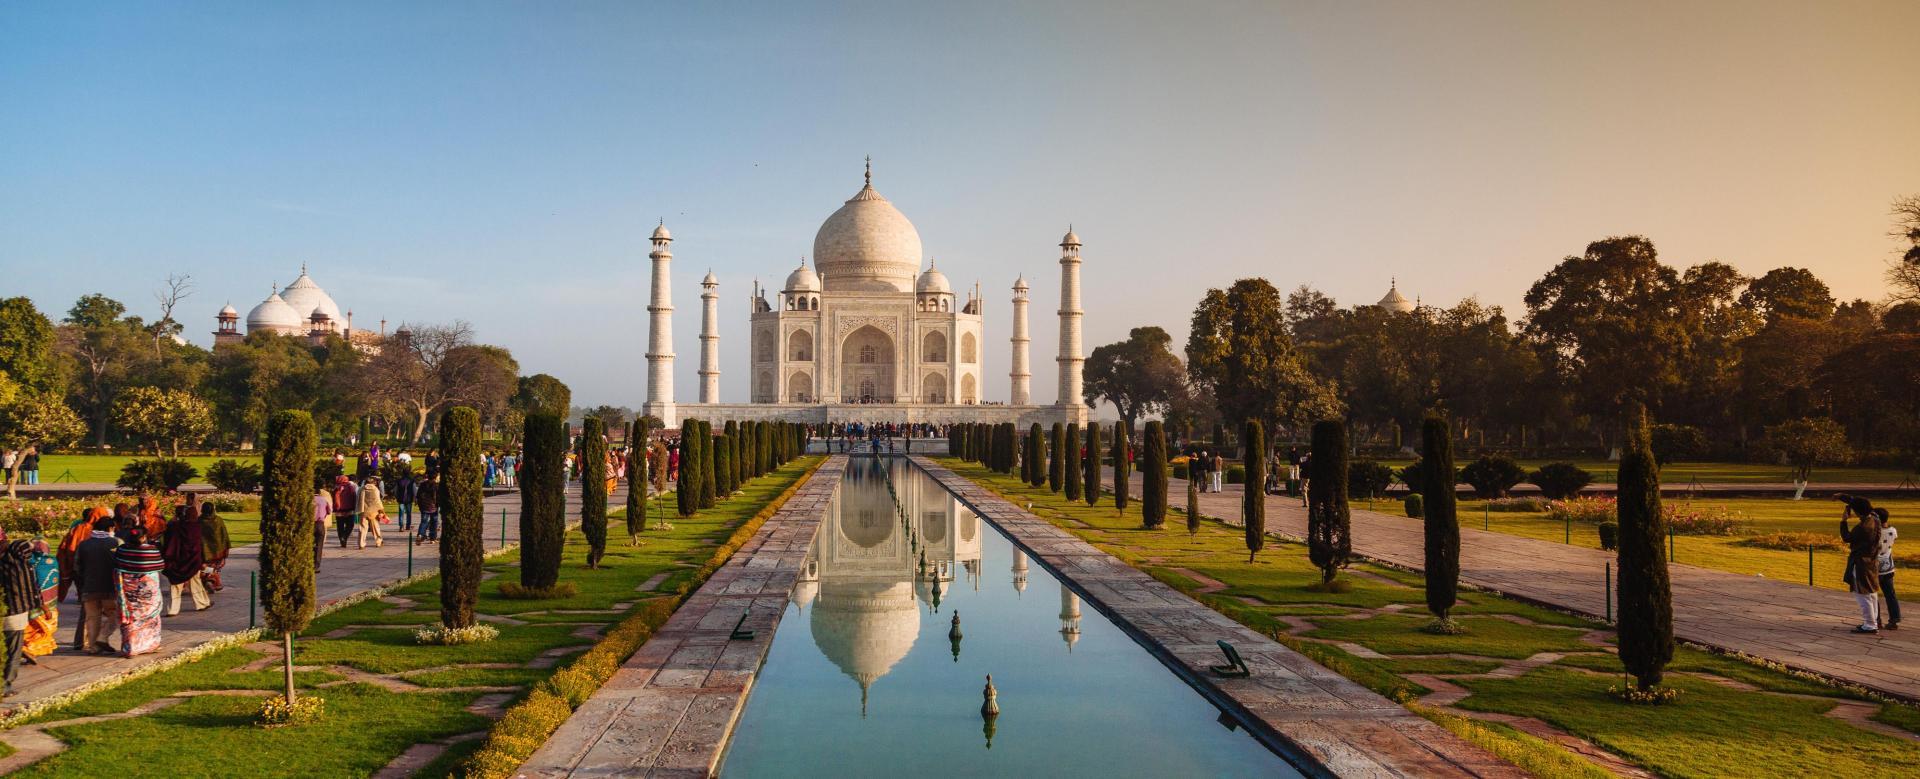 Trekking Inde : Rajasthan, terre des princes